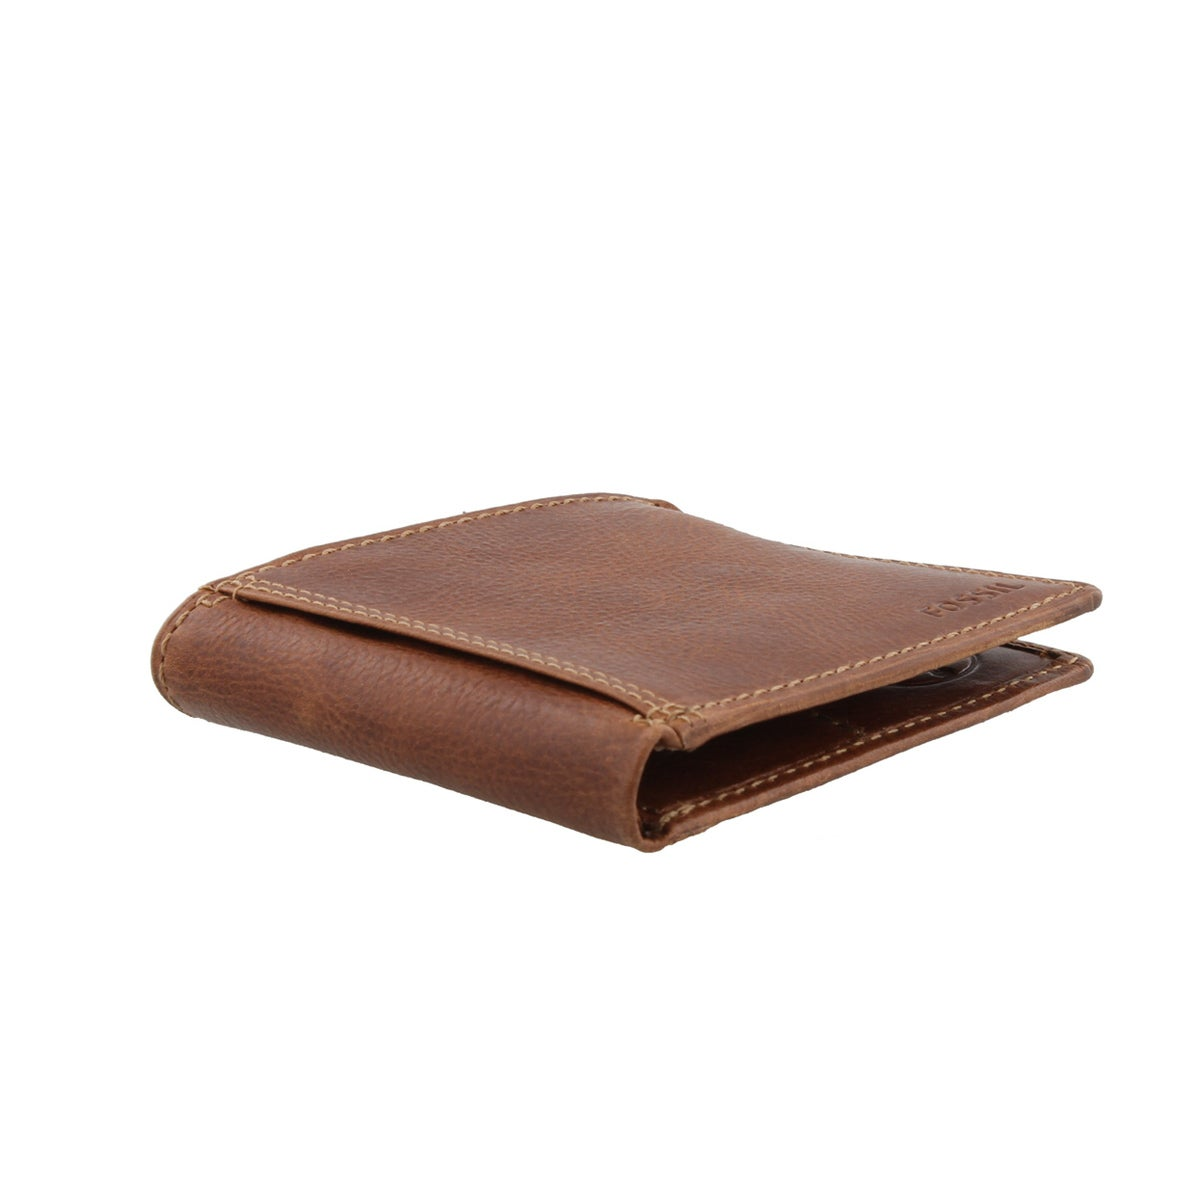 Mns Bradley Slim Bifold tan lthr wallet